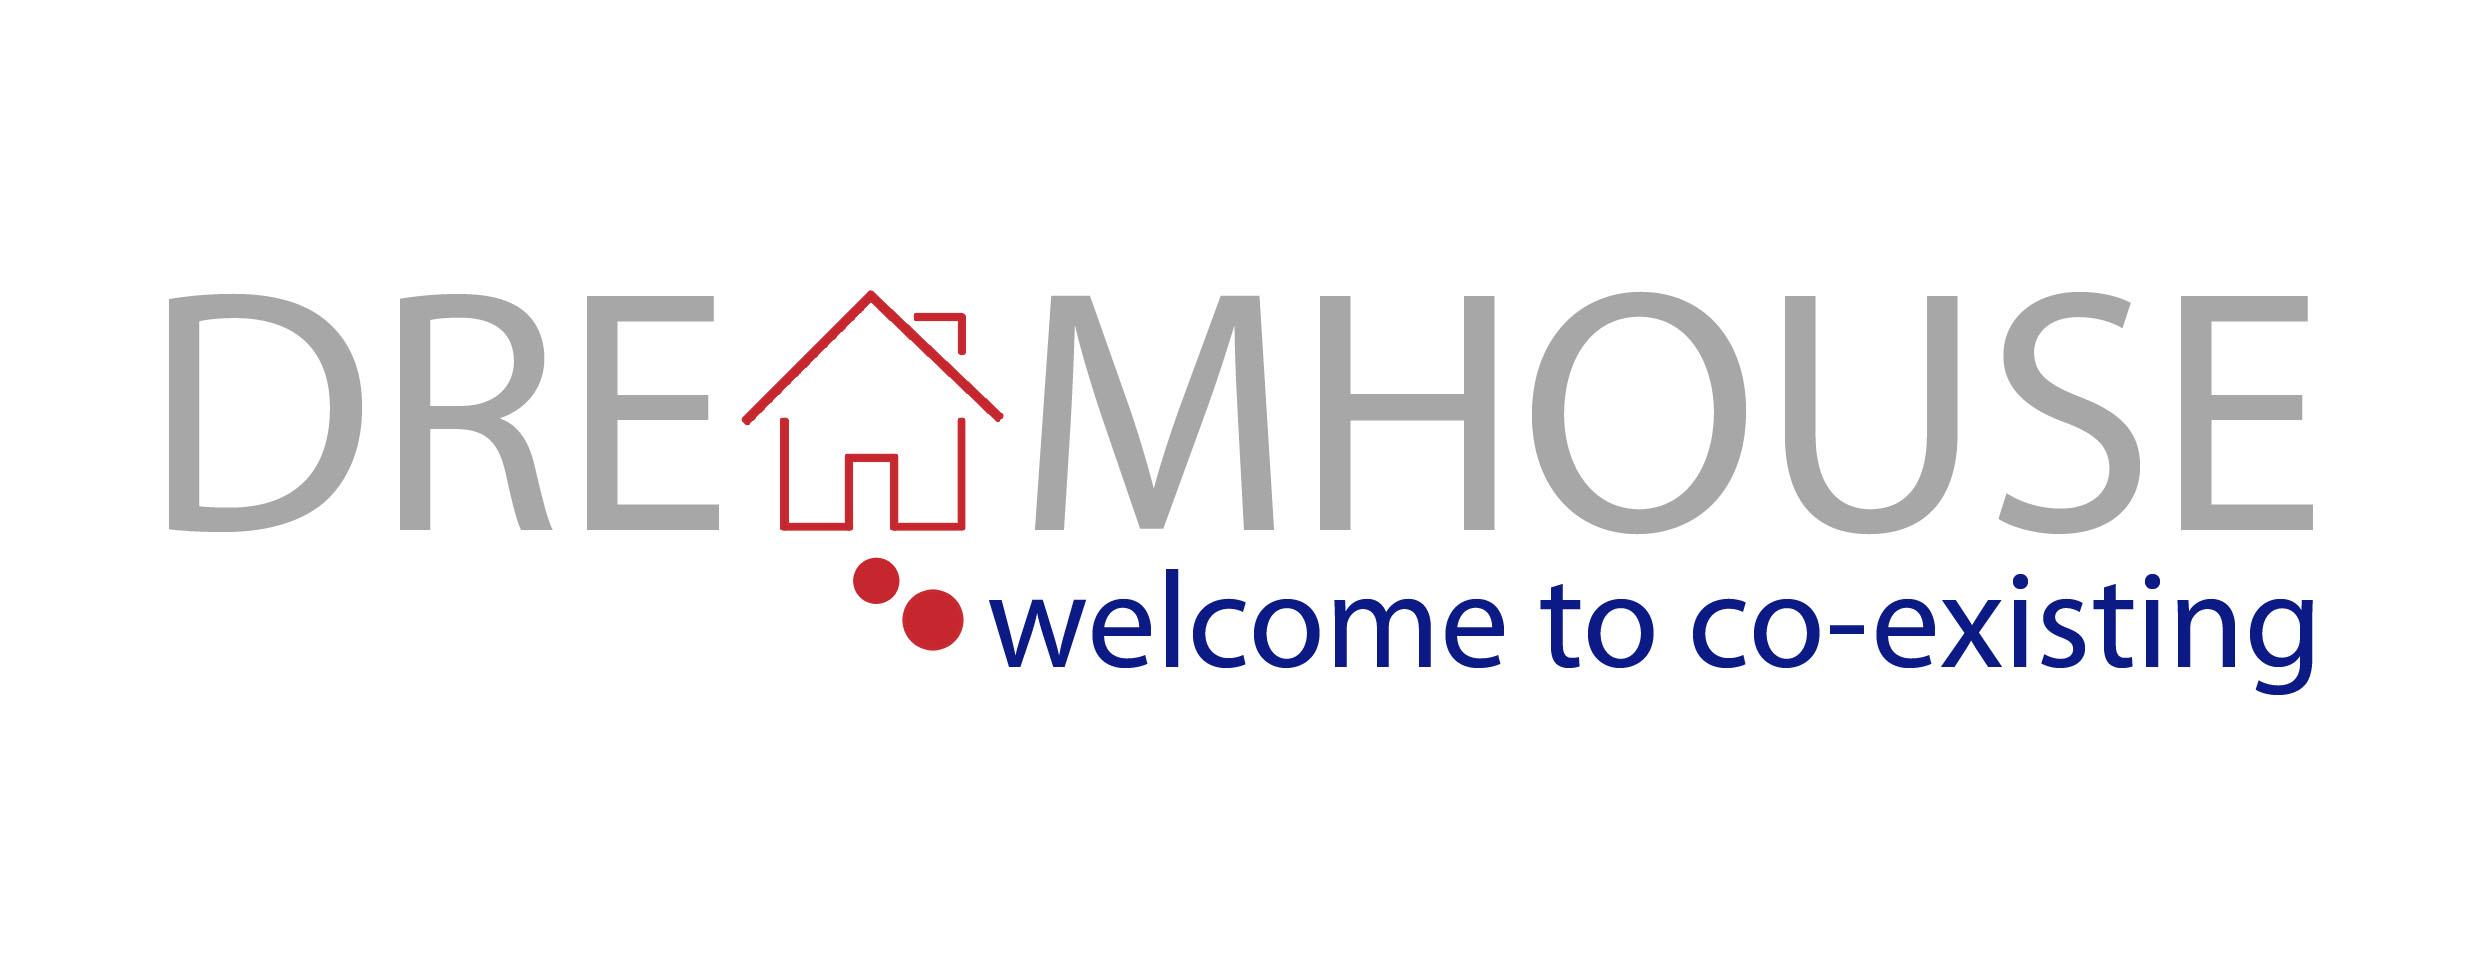 dreamhouse logo.png